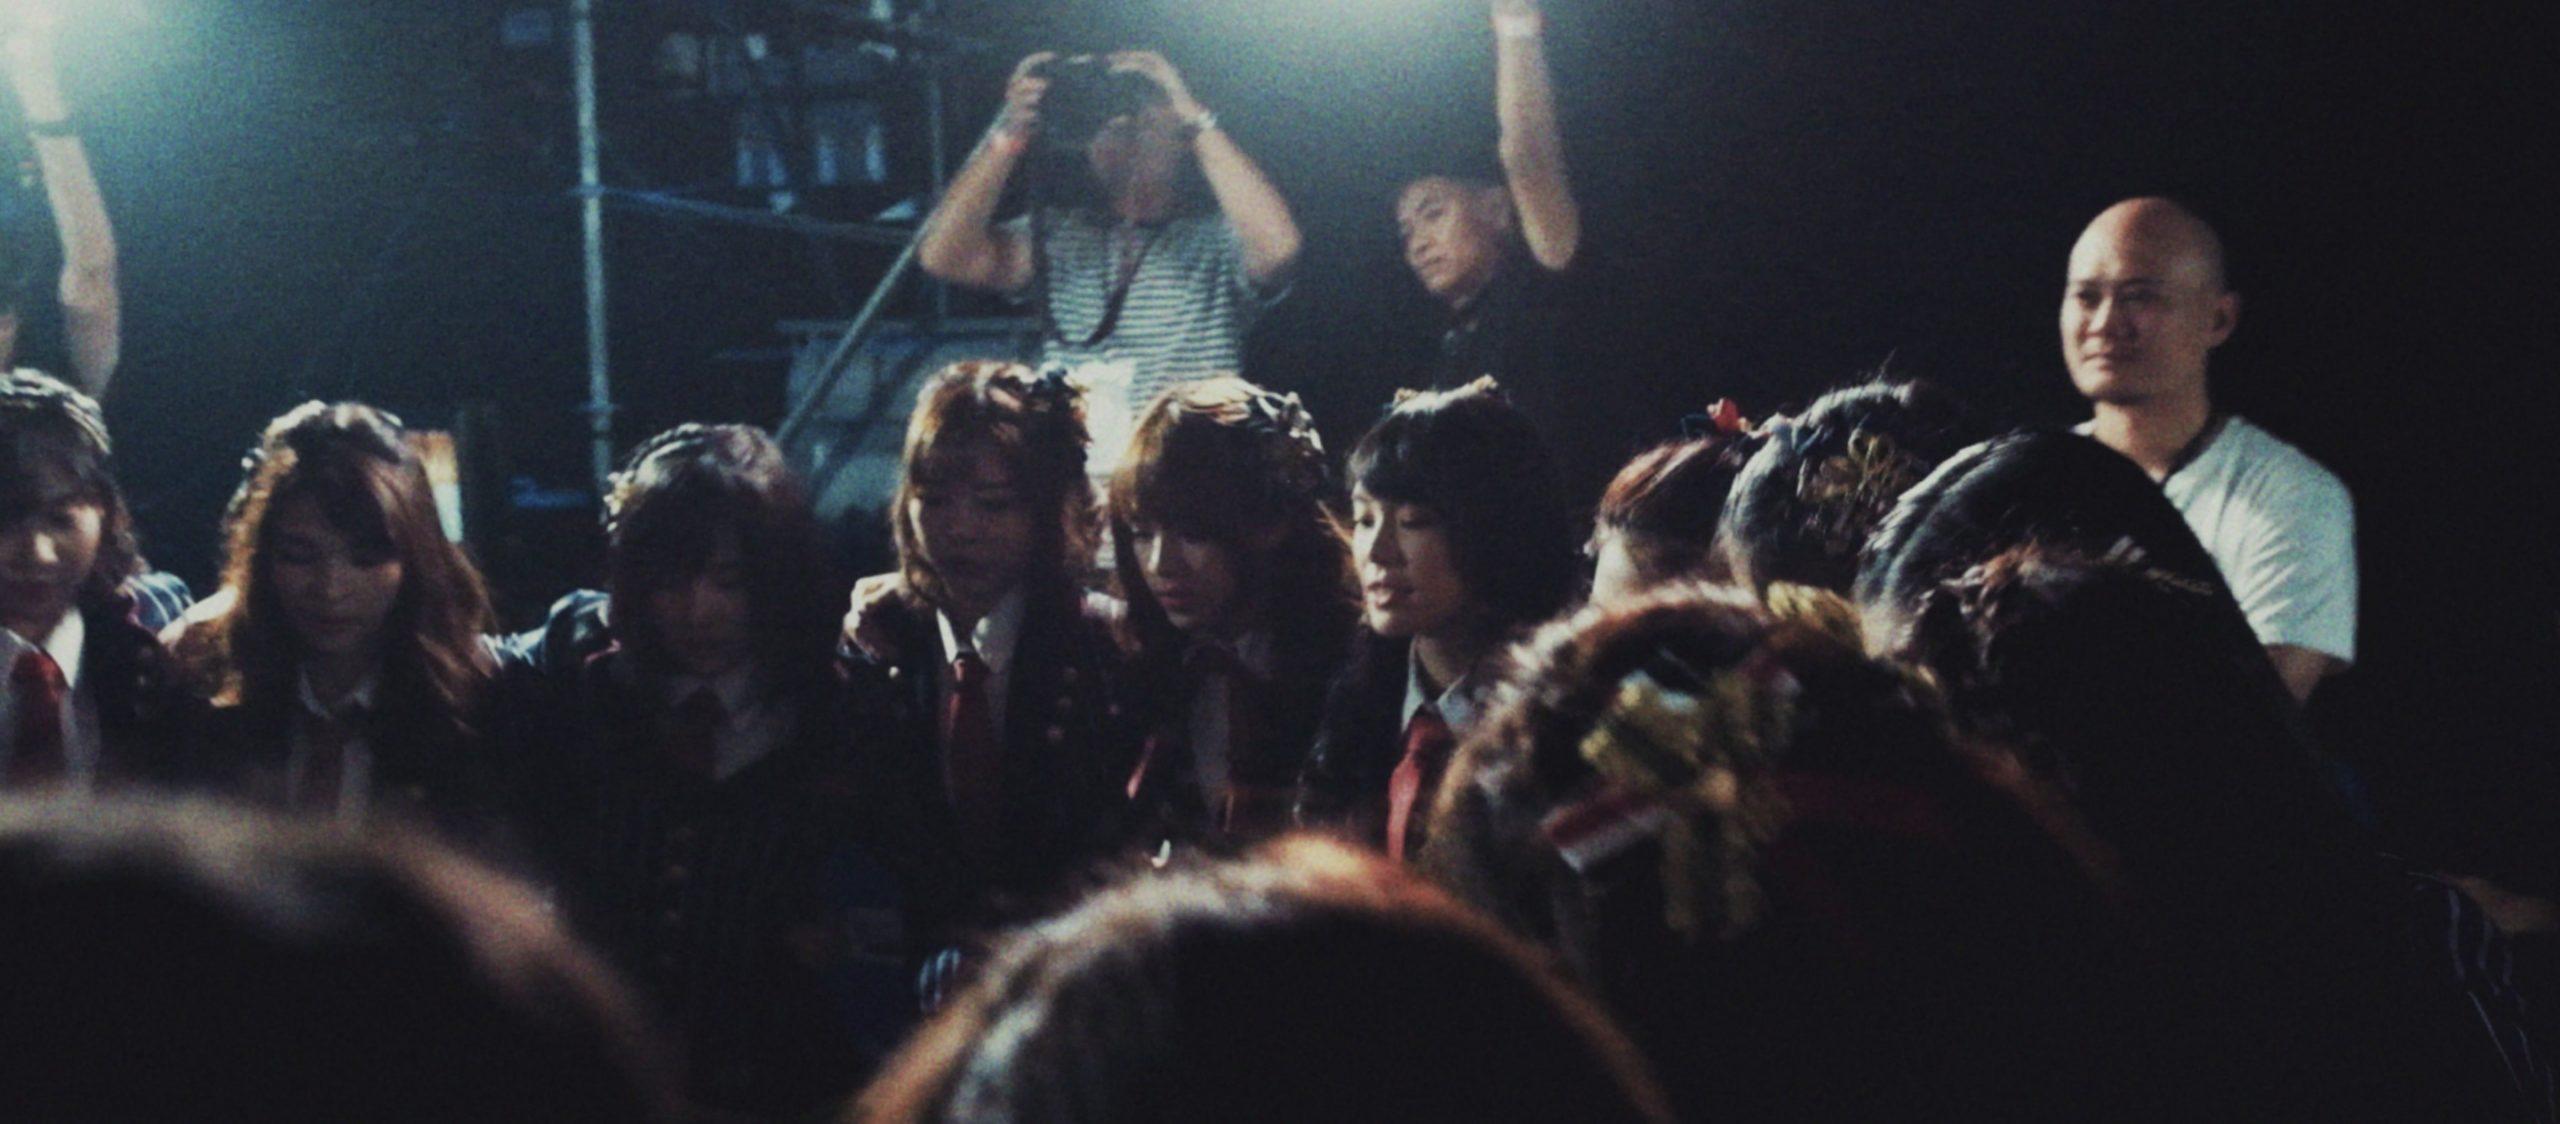 'BNK48 : GIRLS DON'T CRY' สารคดีแห่งน้ำตา ความจริง และสิ่งที่ไม่เคยพูดมาก่อน ของ BNK48